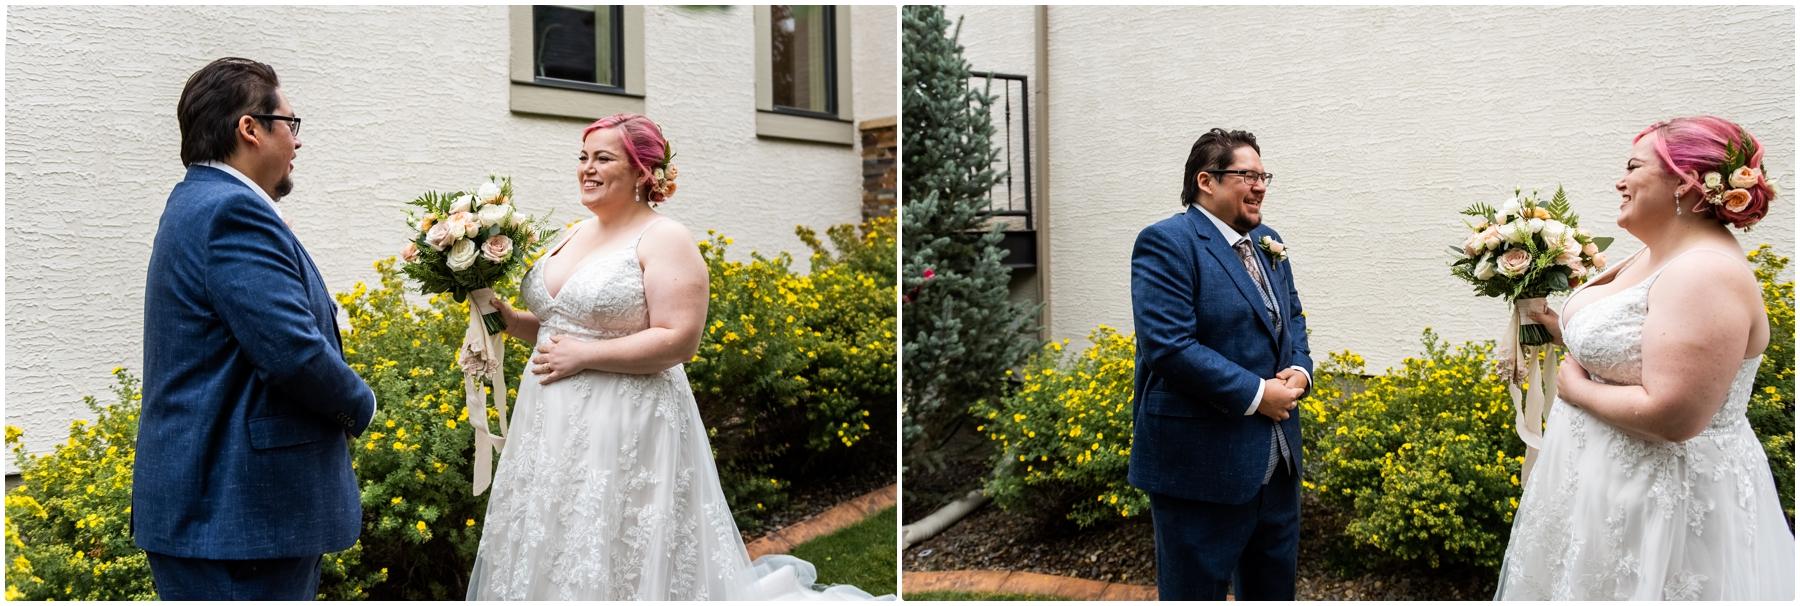 Calgary Alberta Intimate Wedding Photographer